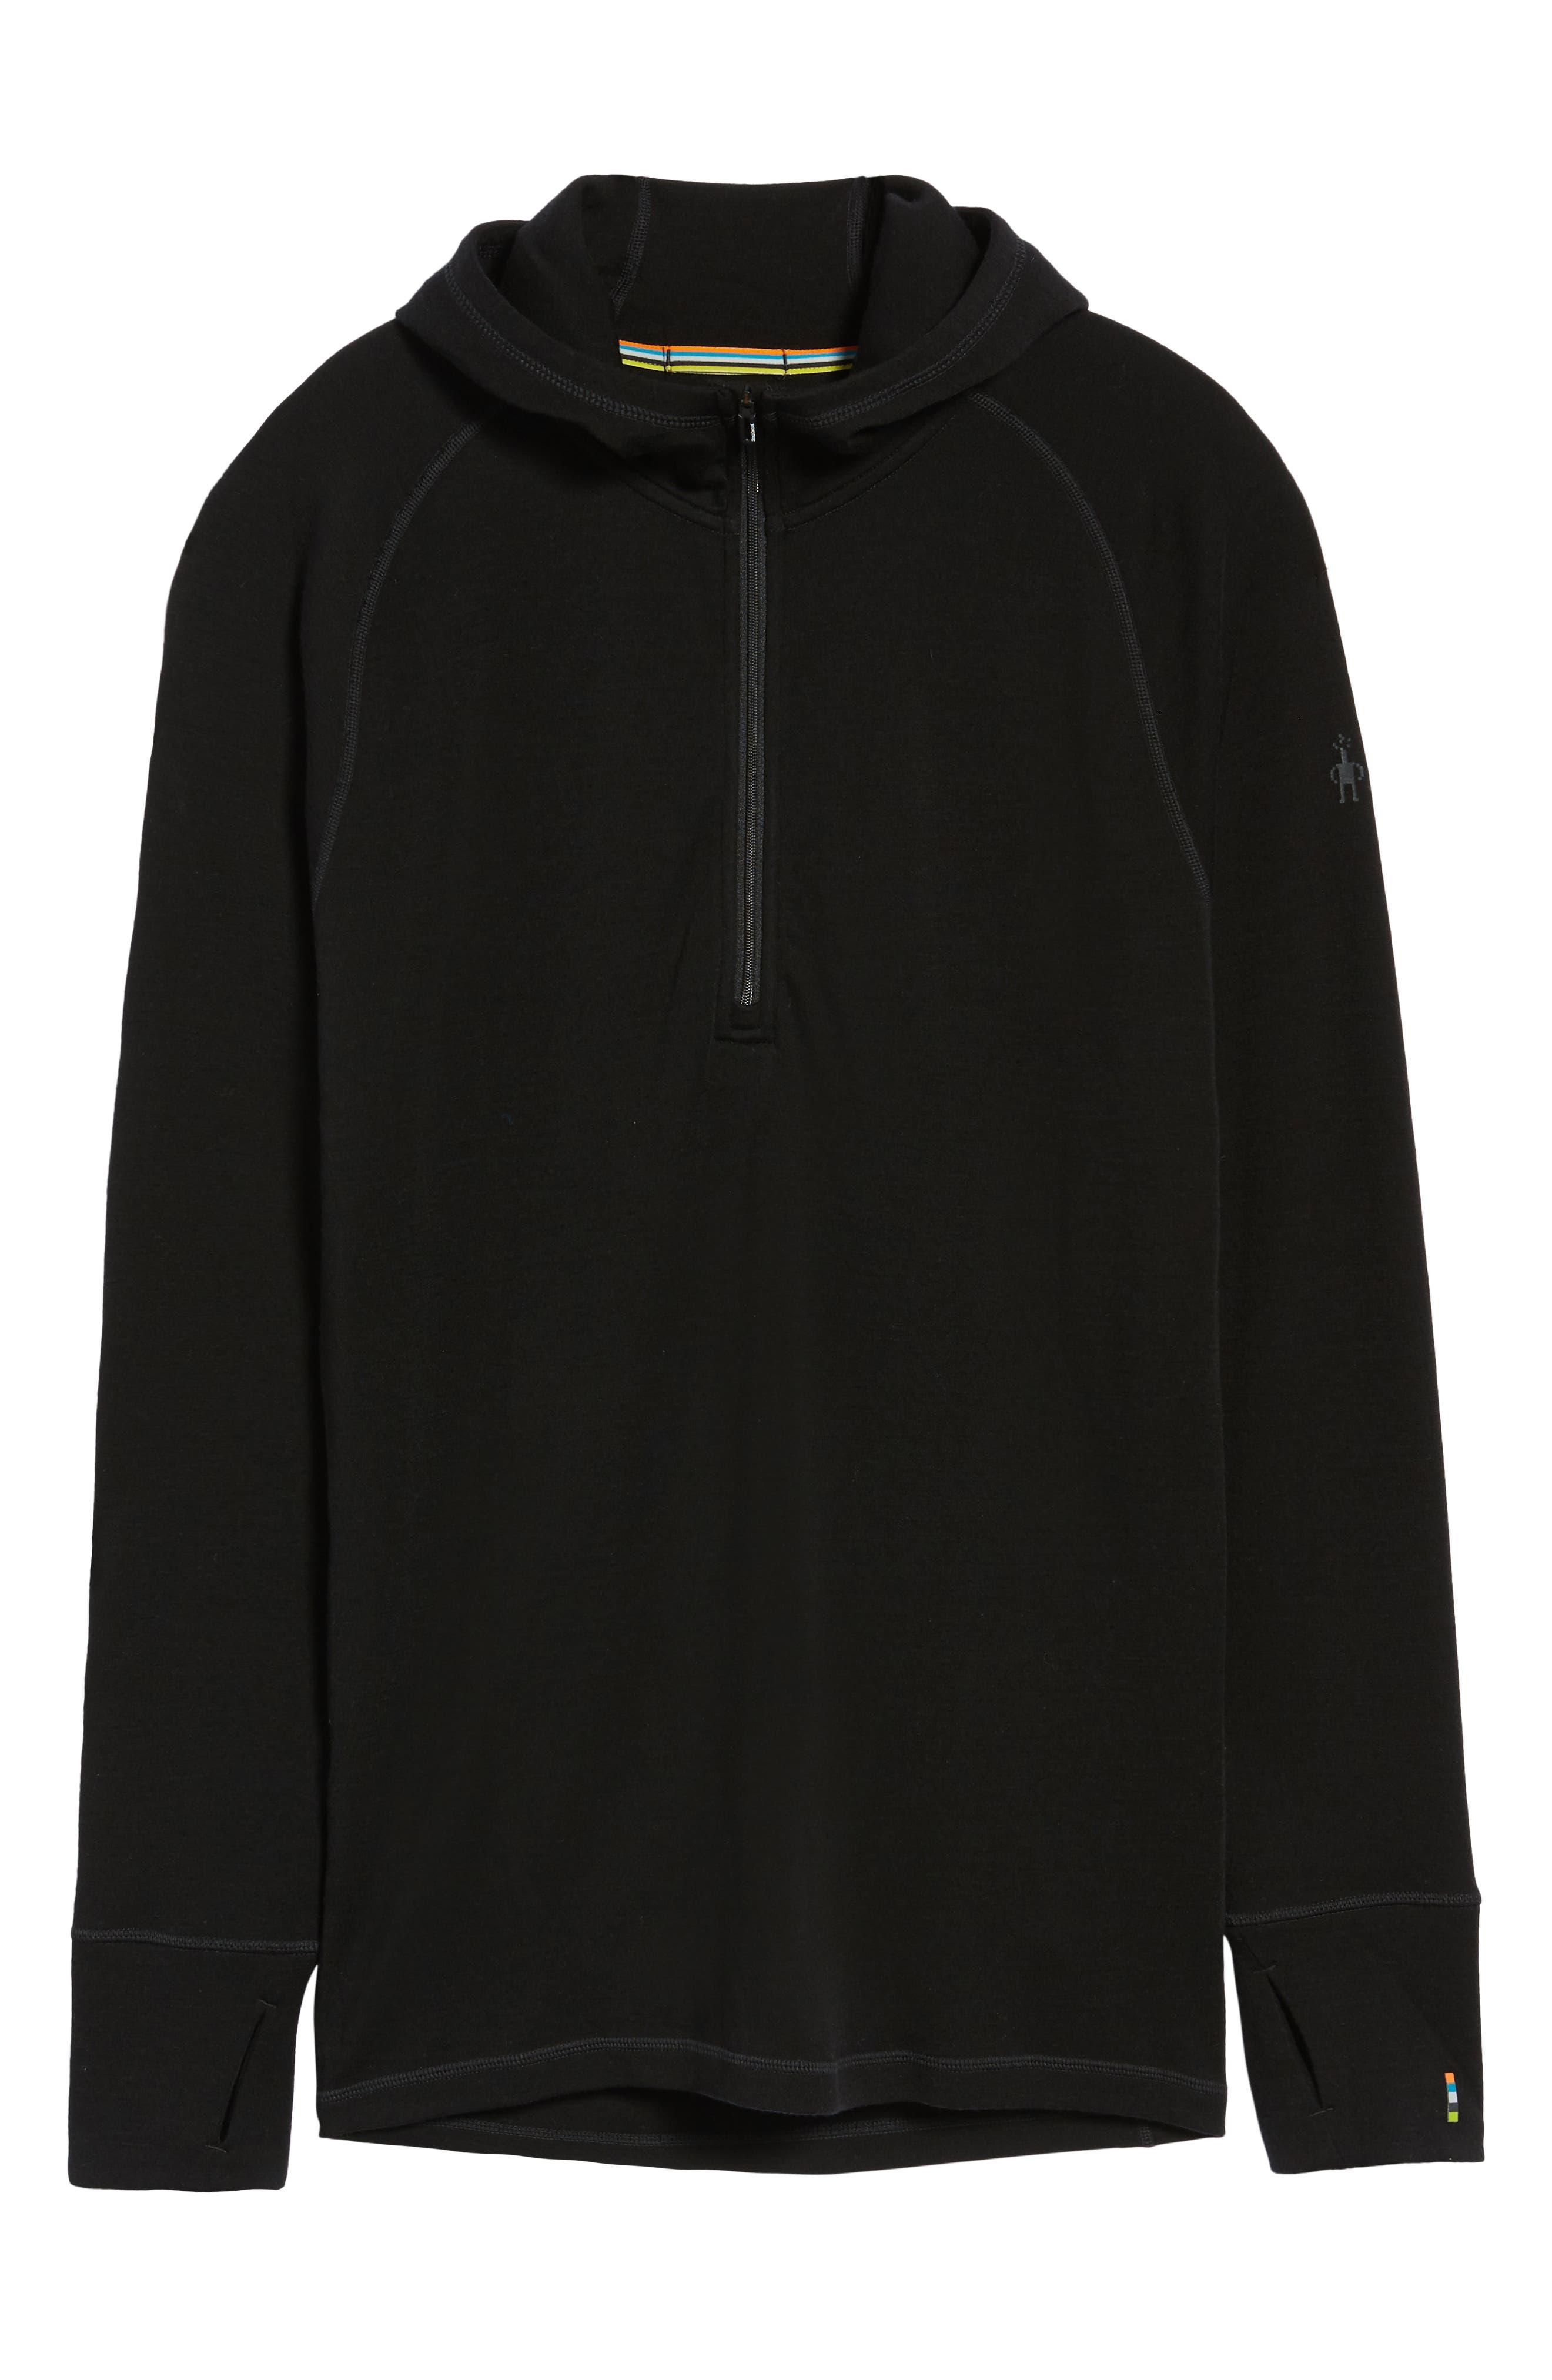 Merino 250 Base Layer Hooded Pullover,                             Alternate thumbnail 6, color,                             001